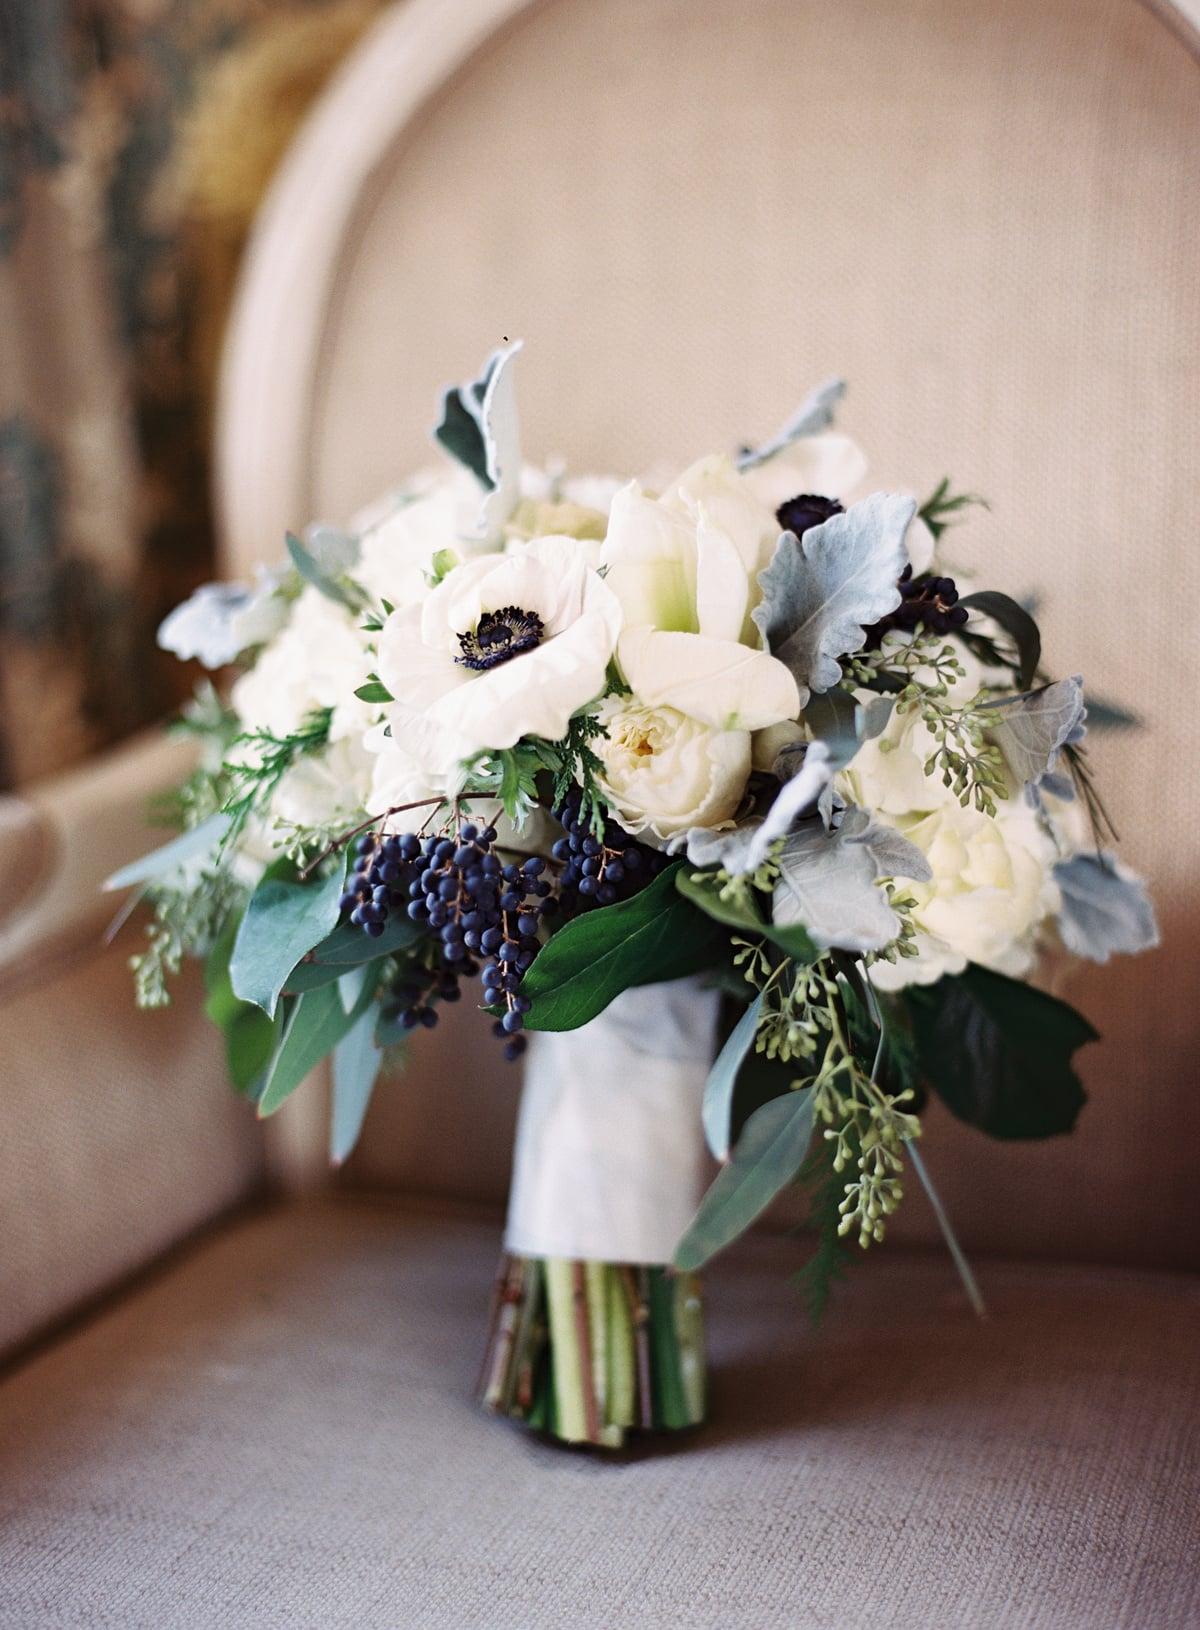 clifton-inn-wedding-001.jpg